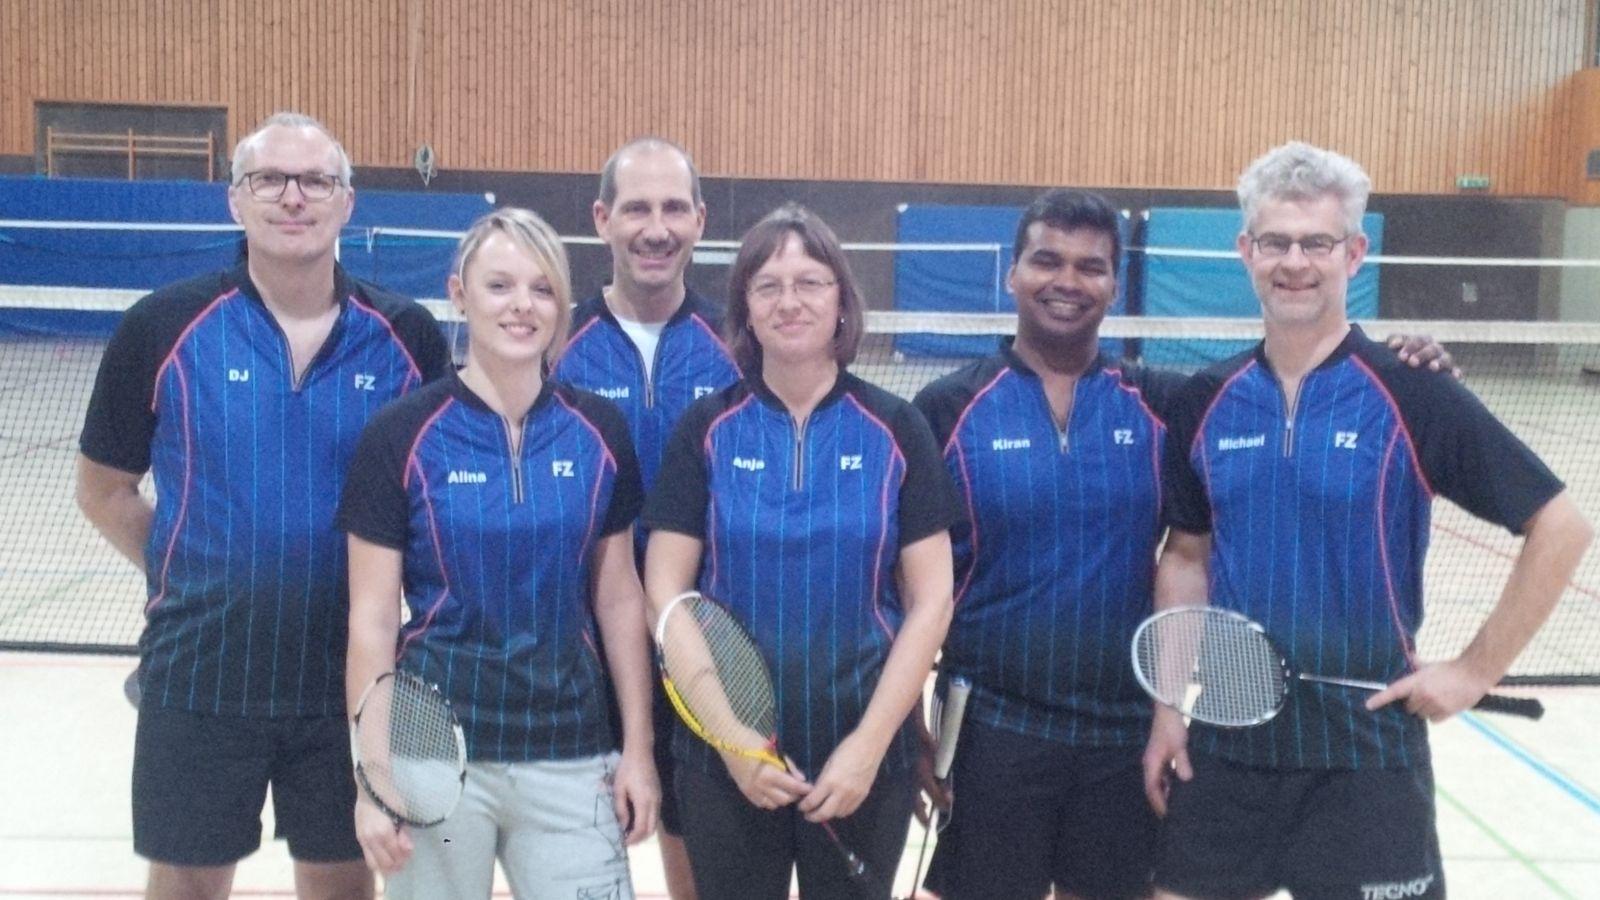 Badminton Werdohl Senioren 2015